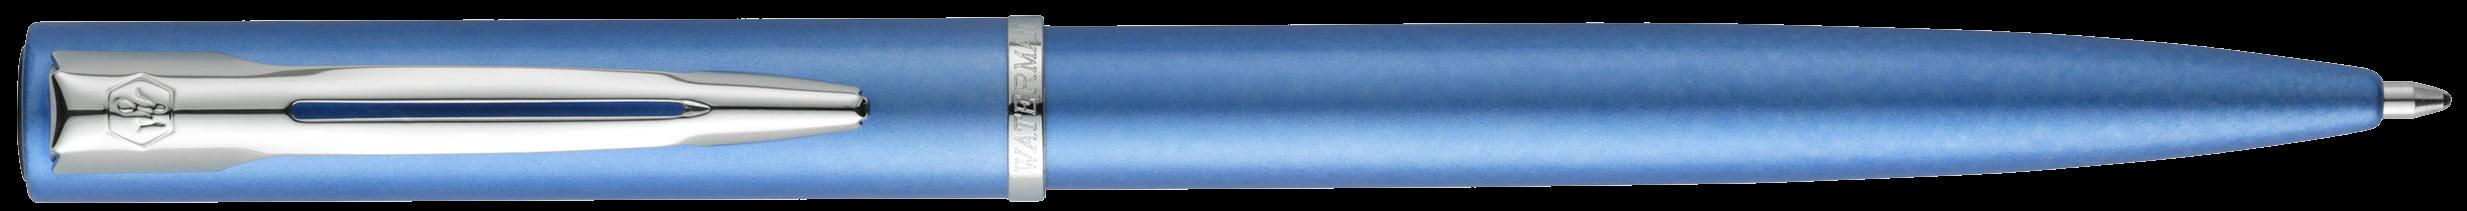 2068191 Waterman Graduate Шариковая ручка   ALLURE, цвет: голубой